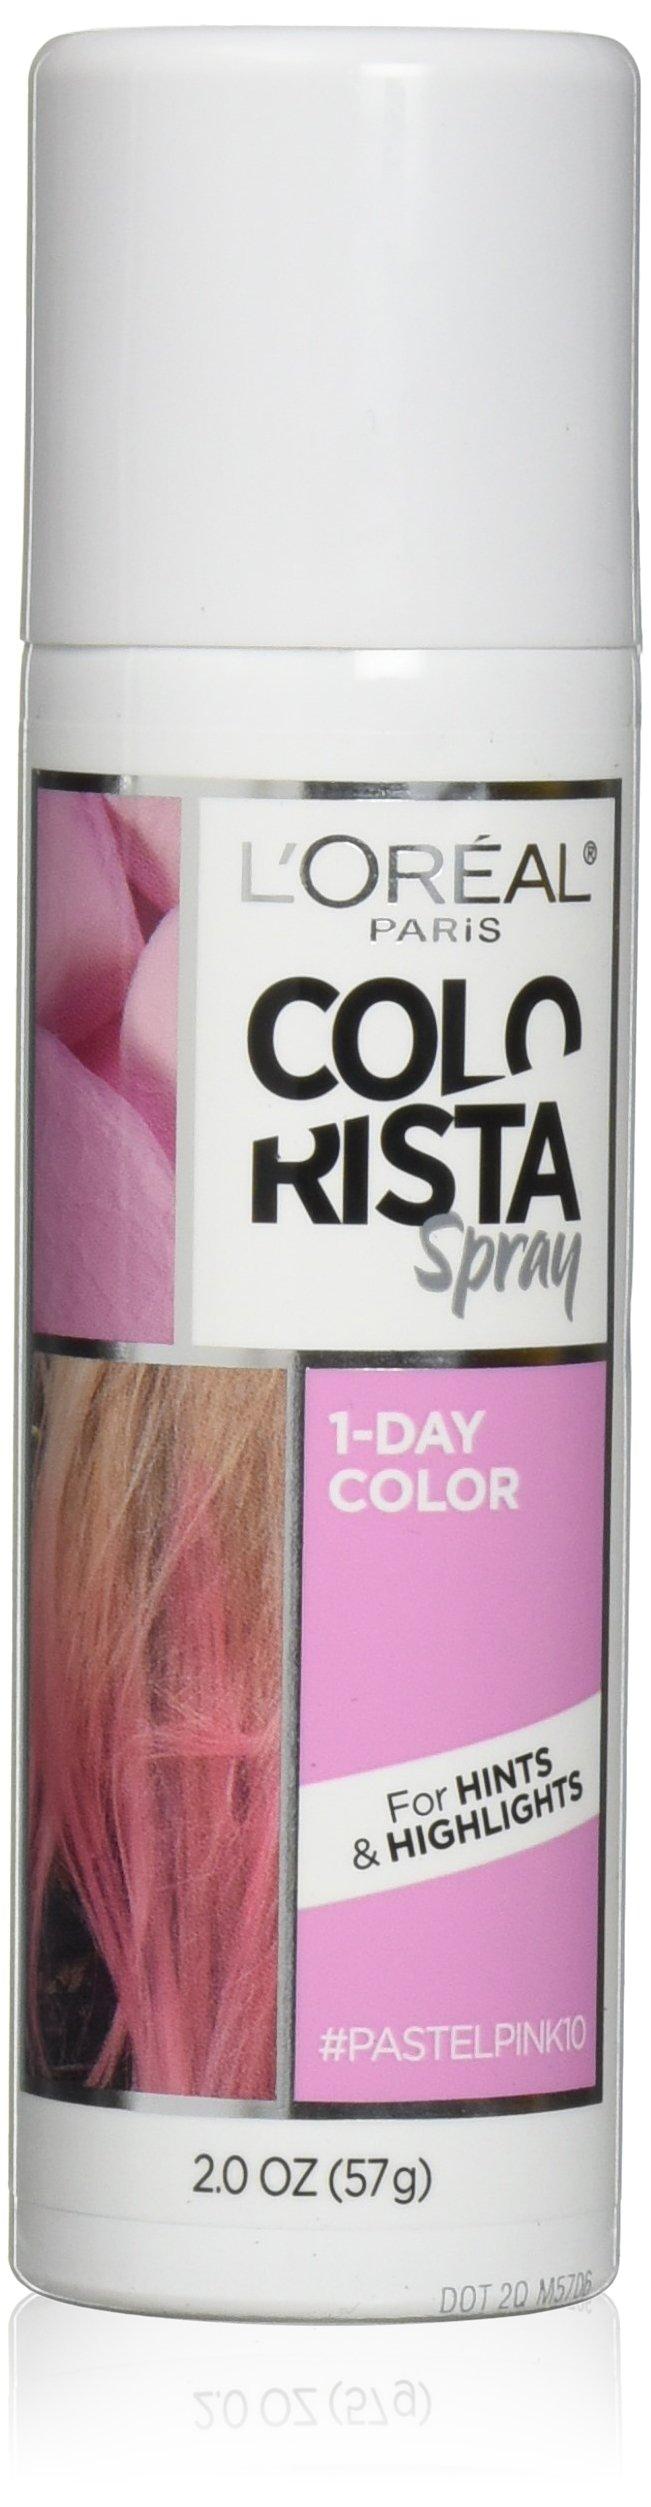 Amazon Loreal Paris Hair Color Colorista 1 Day Spray Rosegold